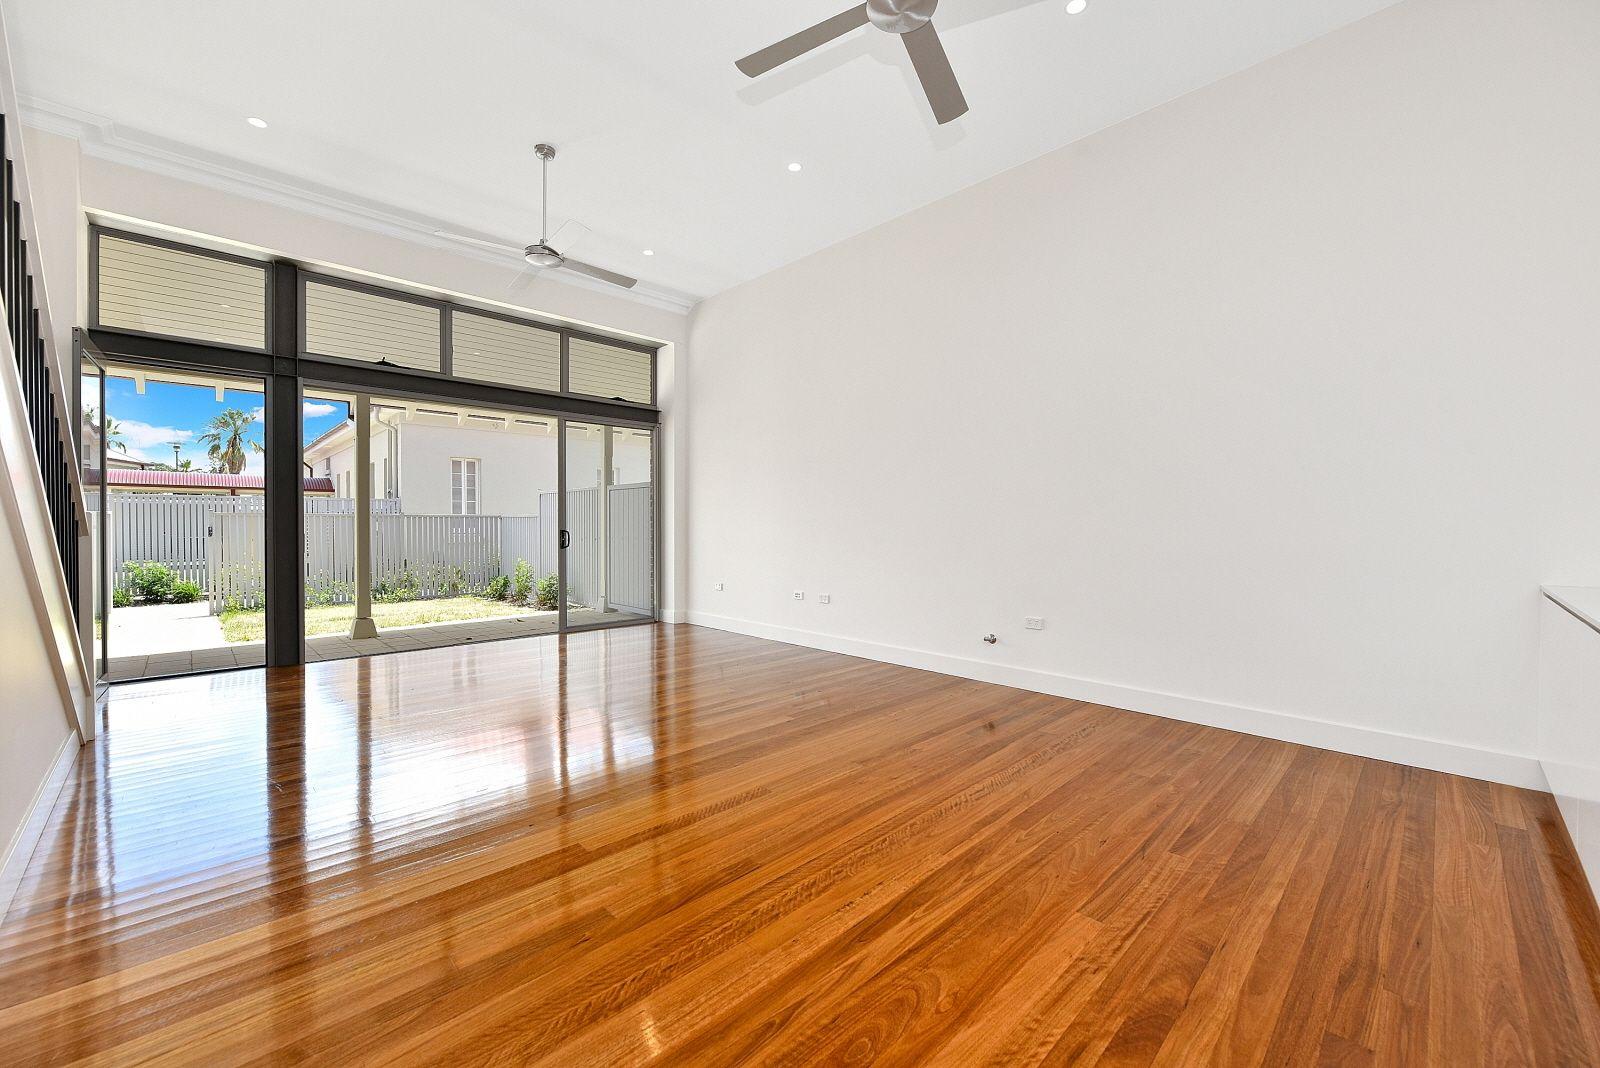 10 Gallery Walk, Lidcombe NSW 2141, Image 1